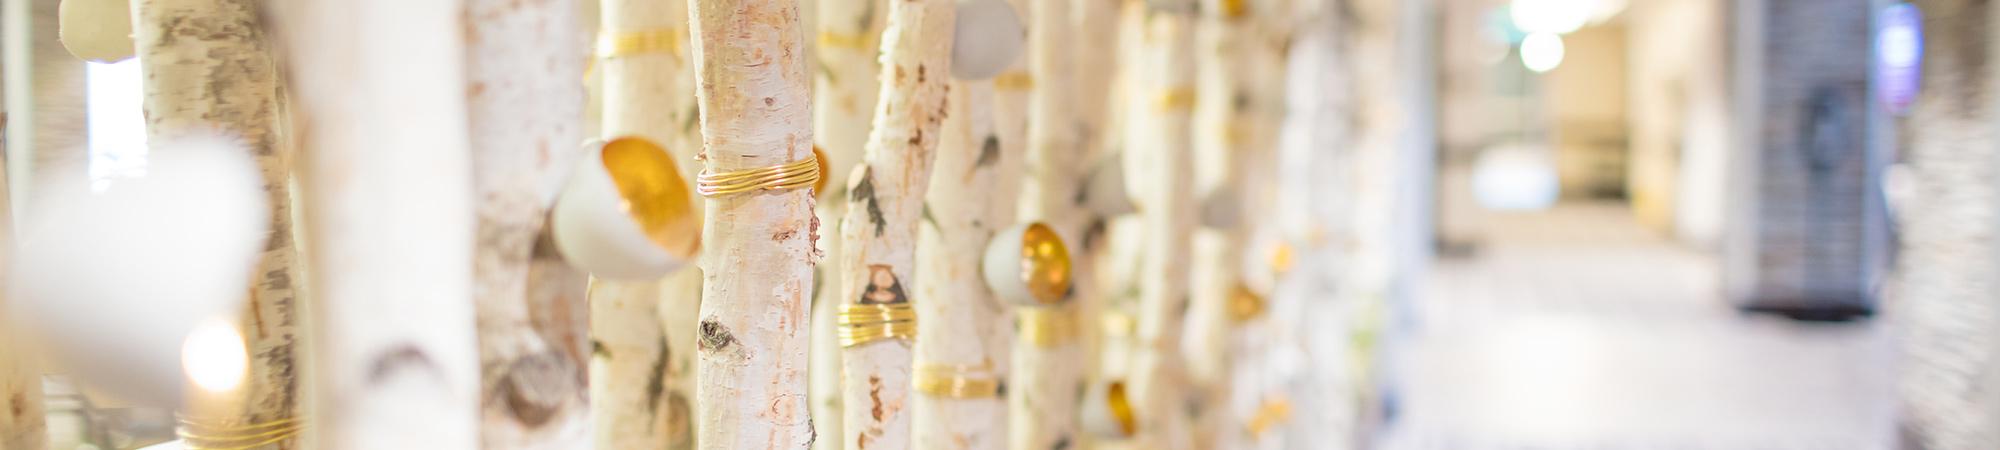 Decorative gold hallway feature